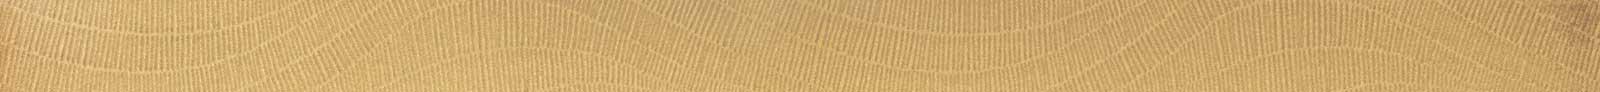 LIST RLV. IPANEMA GOLD 3X60